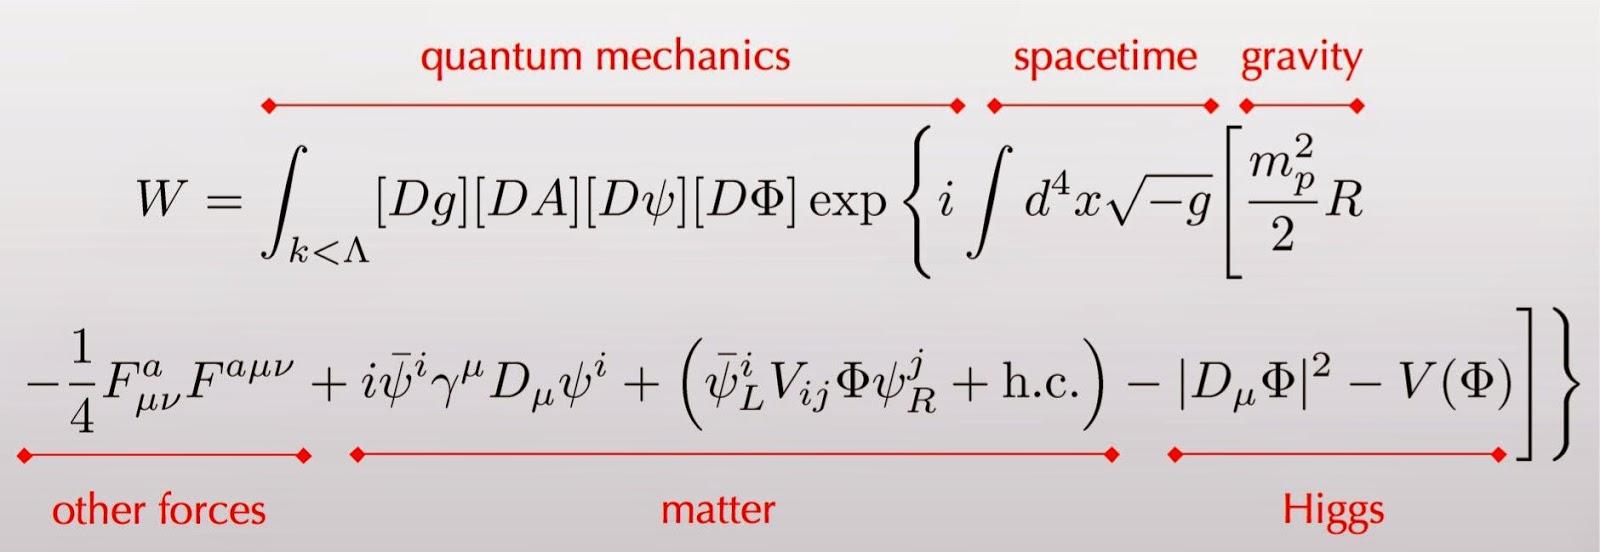 Everyday-Equation.jpg